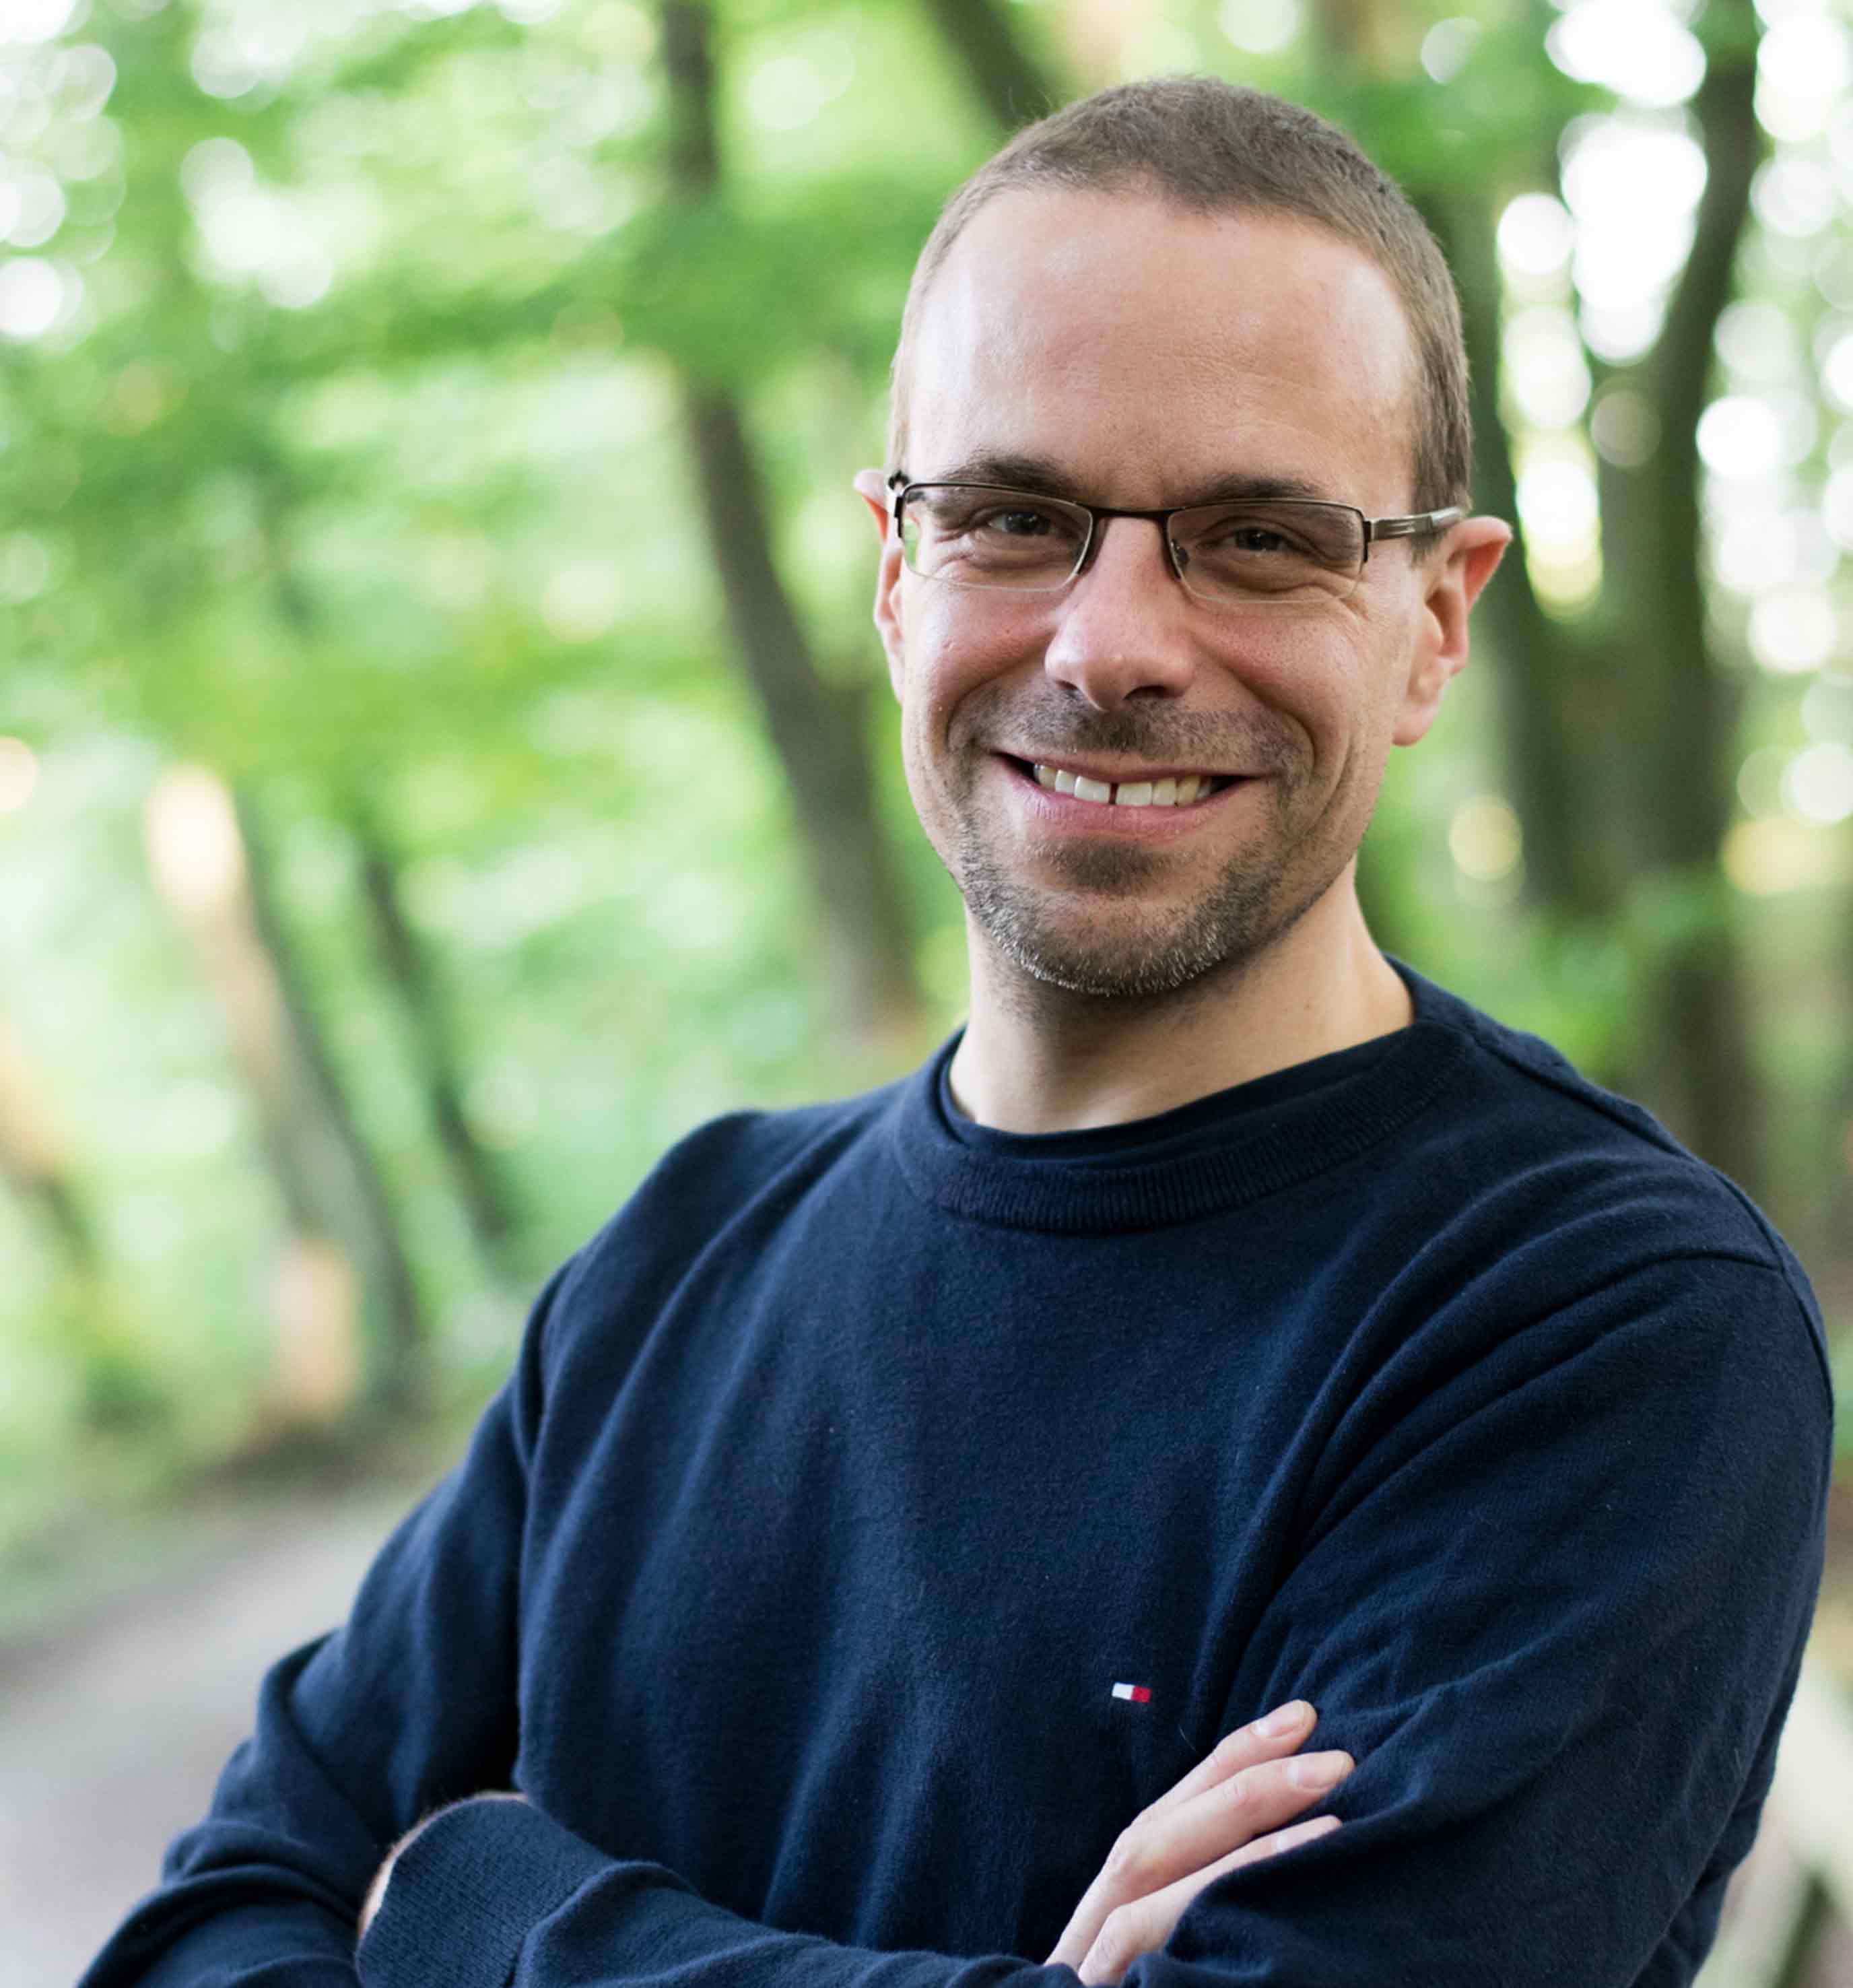 Thomas Achenbach